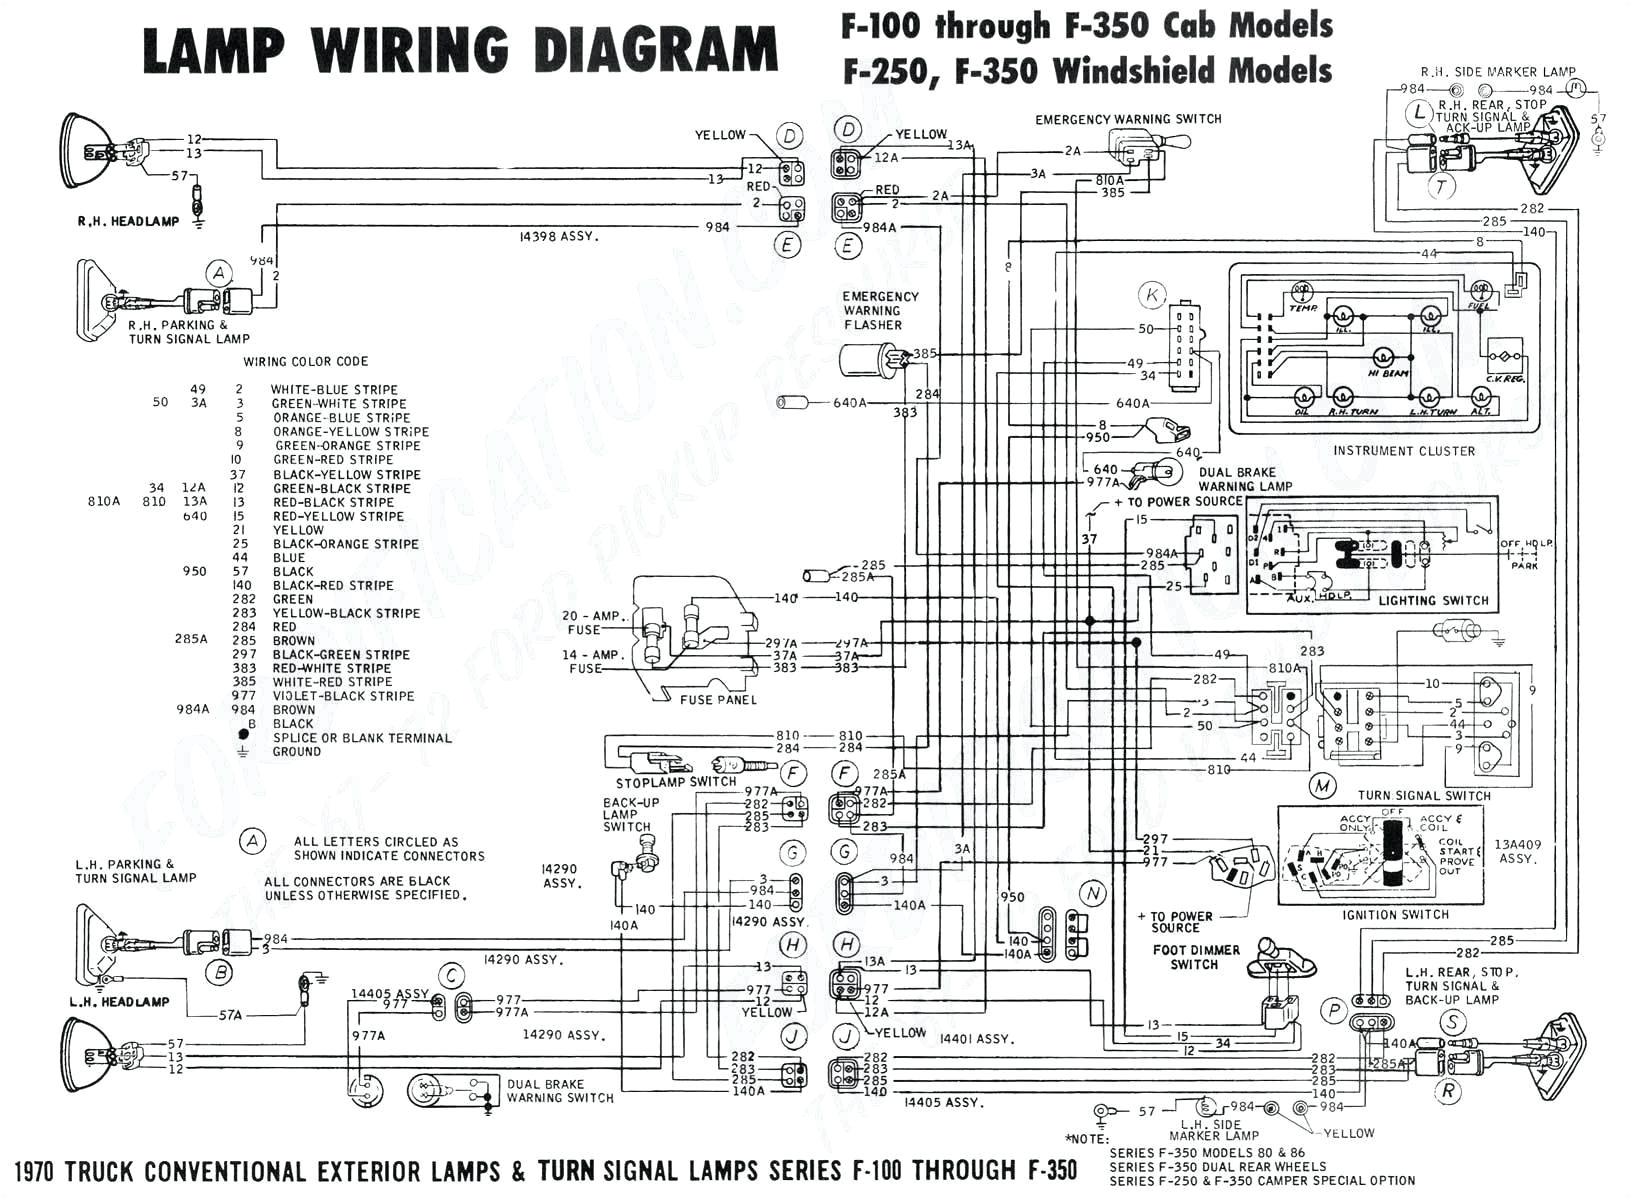 vermeer wiring schematic wiring diagram info vermeer alternator wiring diagram